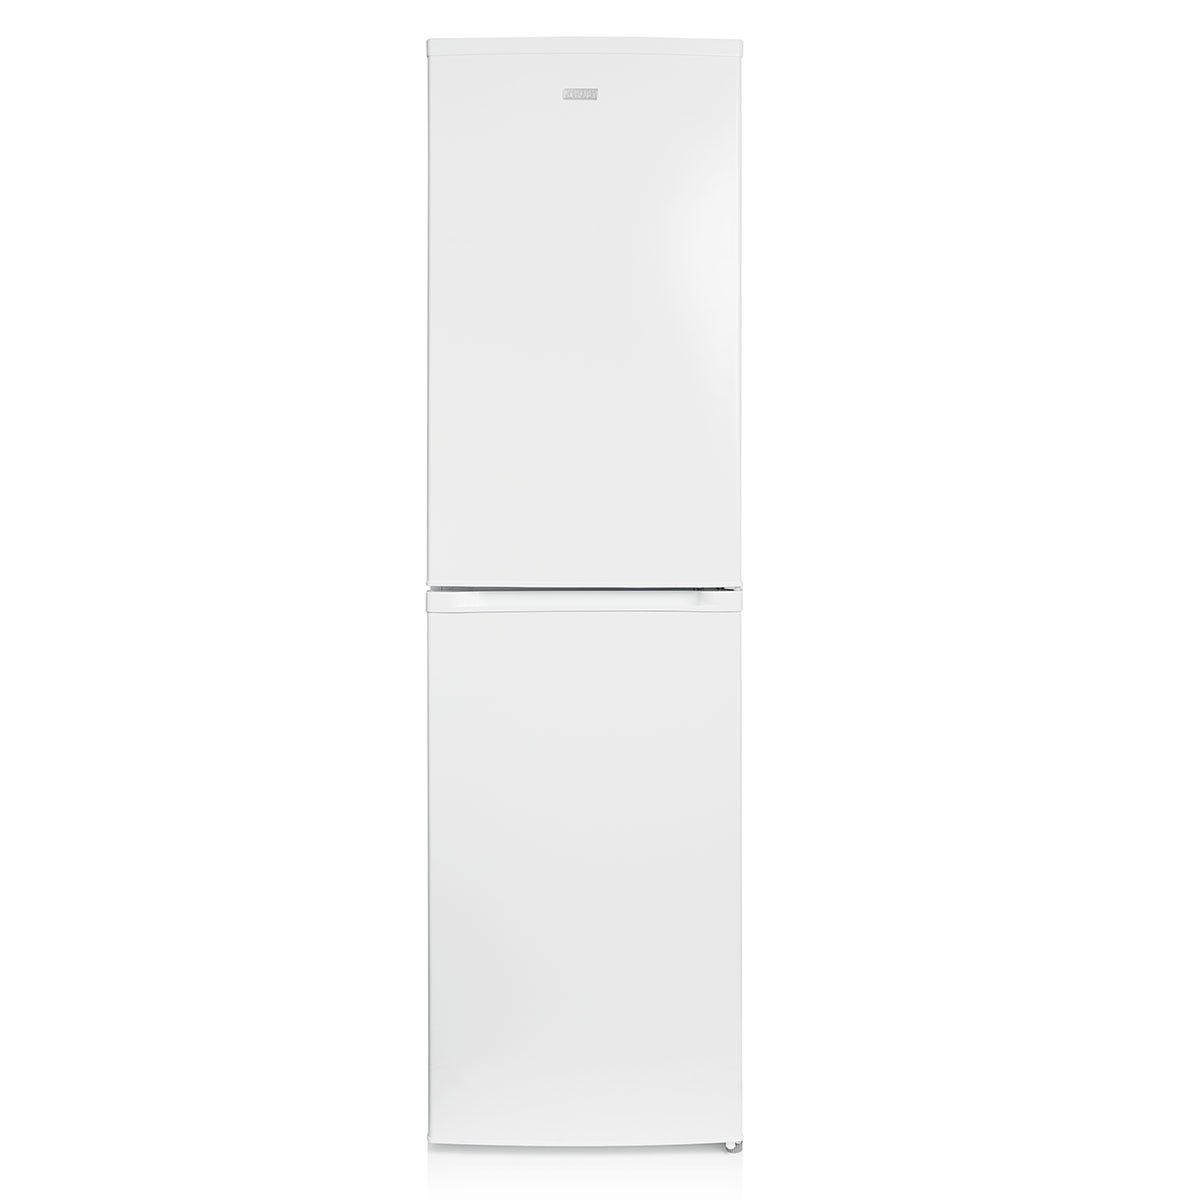 Haden HFF200W 55cm Total No Frost 50:50 275L Fridge Freezer - White